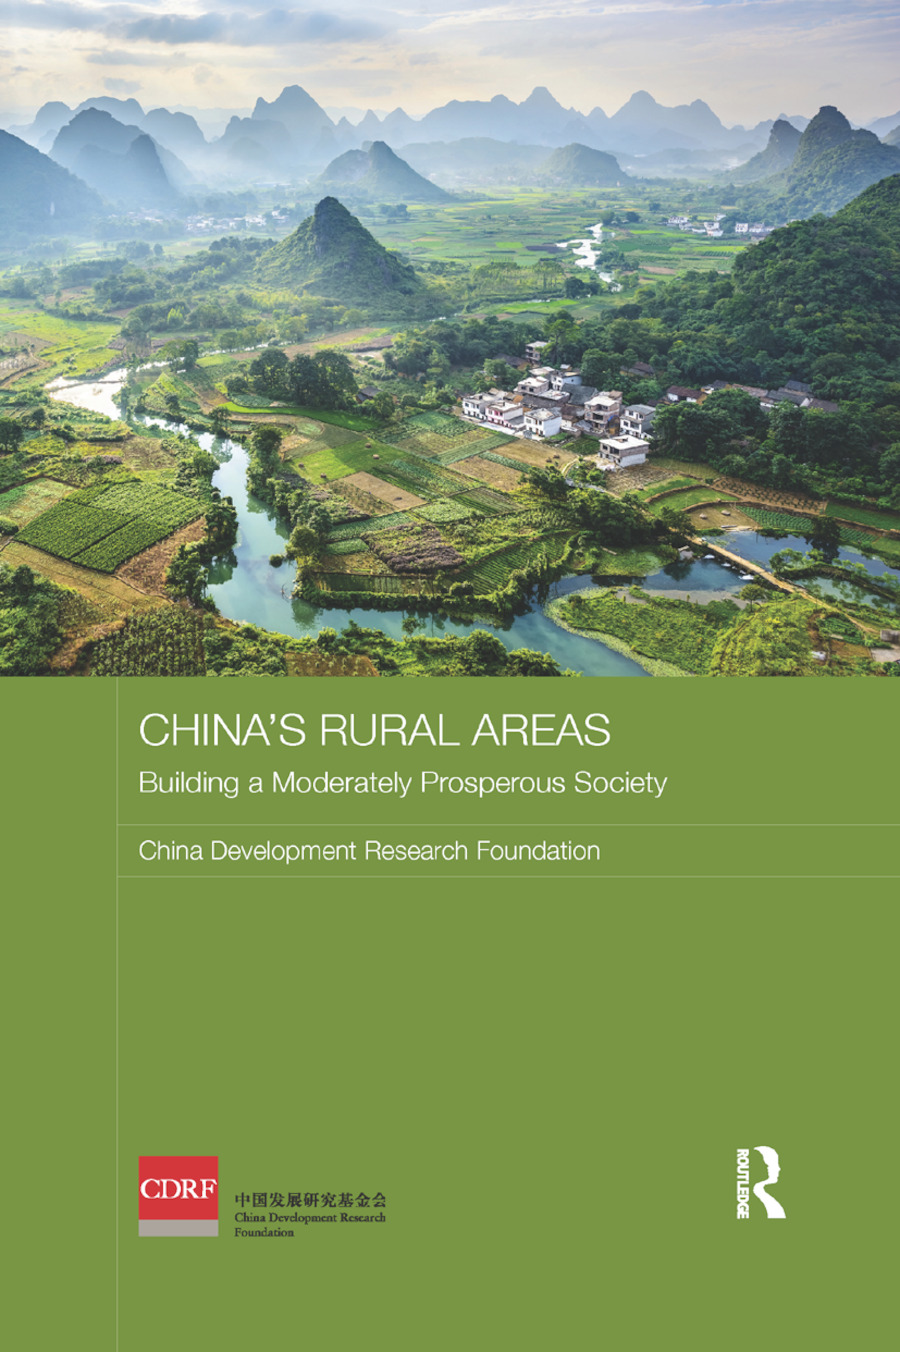 China's Rural Areas